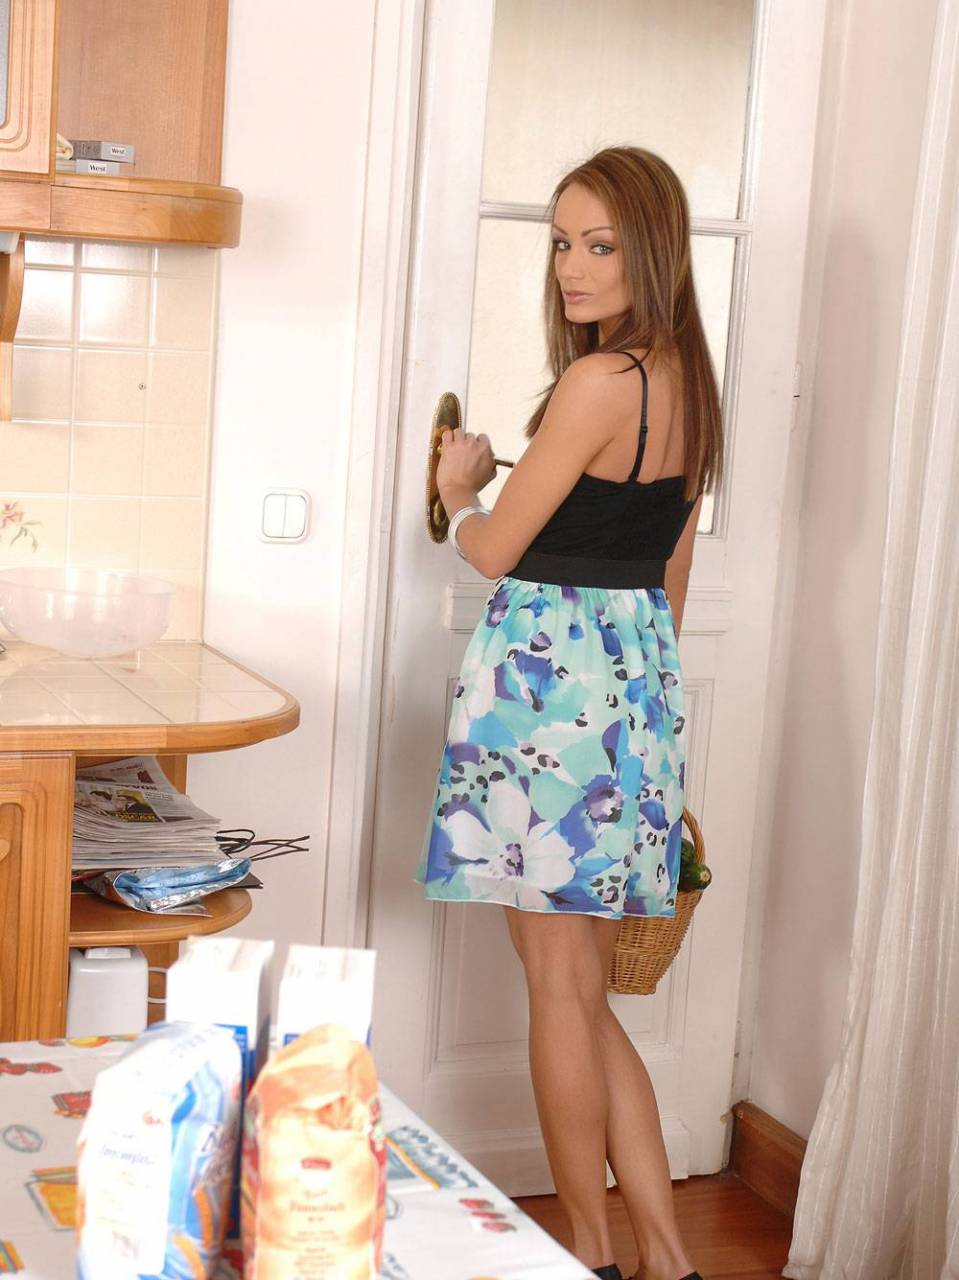 Sophia Lindner 2021-09-02